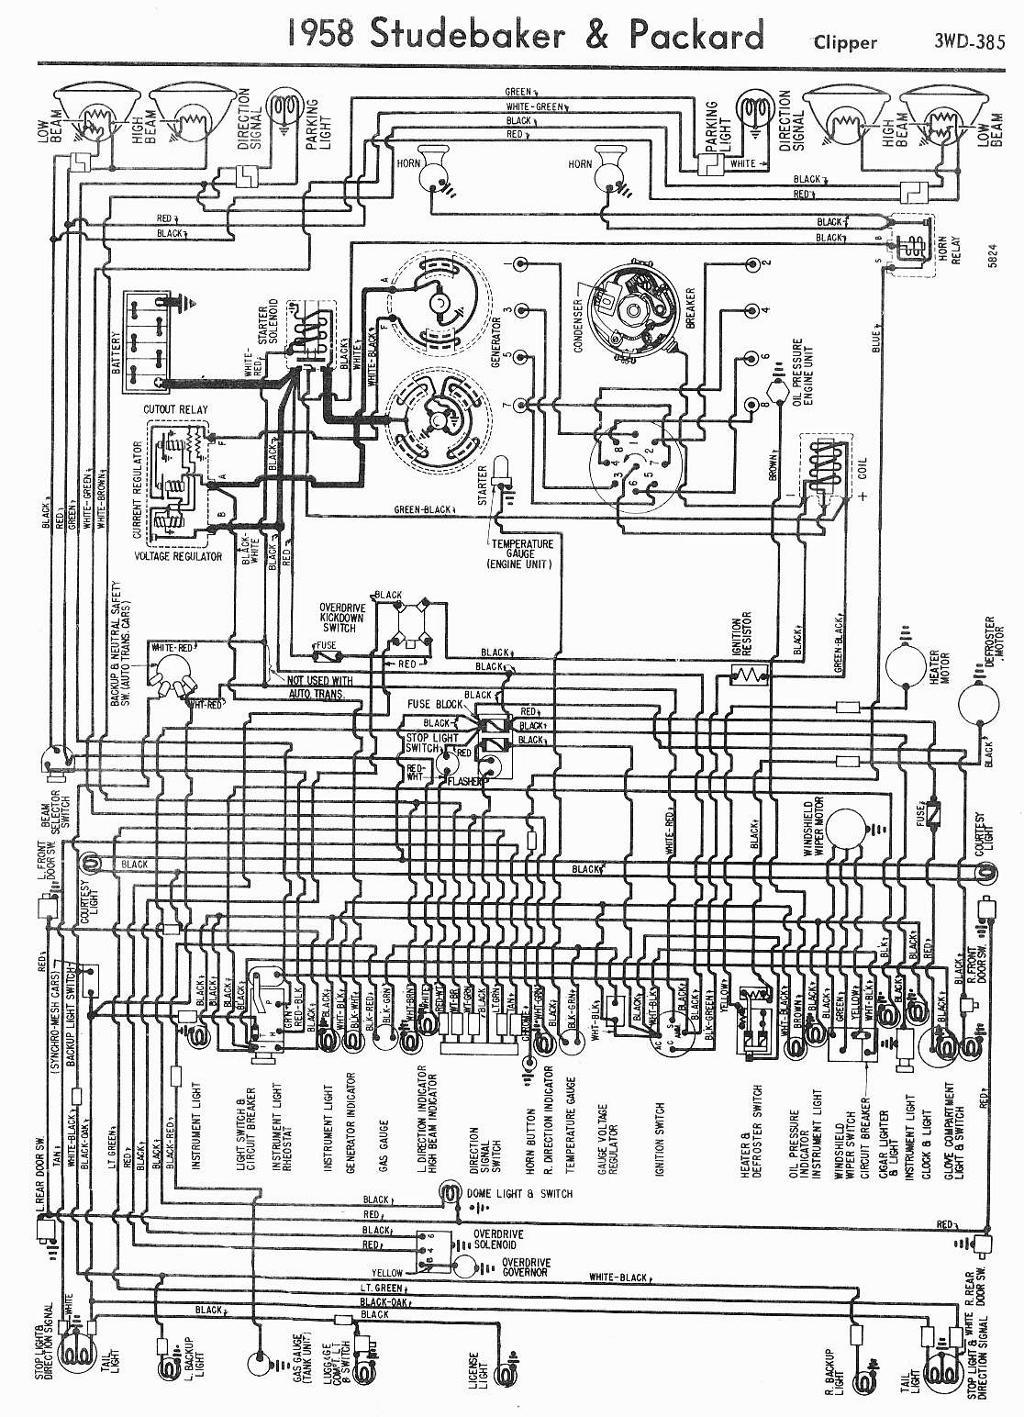 Packard Car Manuals Wiring Diagrams Pdf Fault Codes 1955 Diagram Download